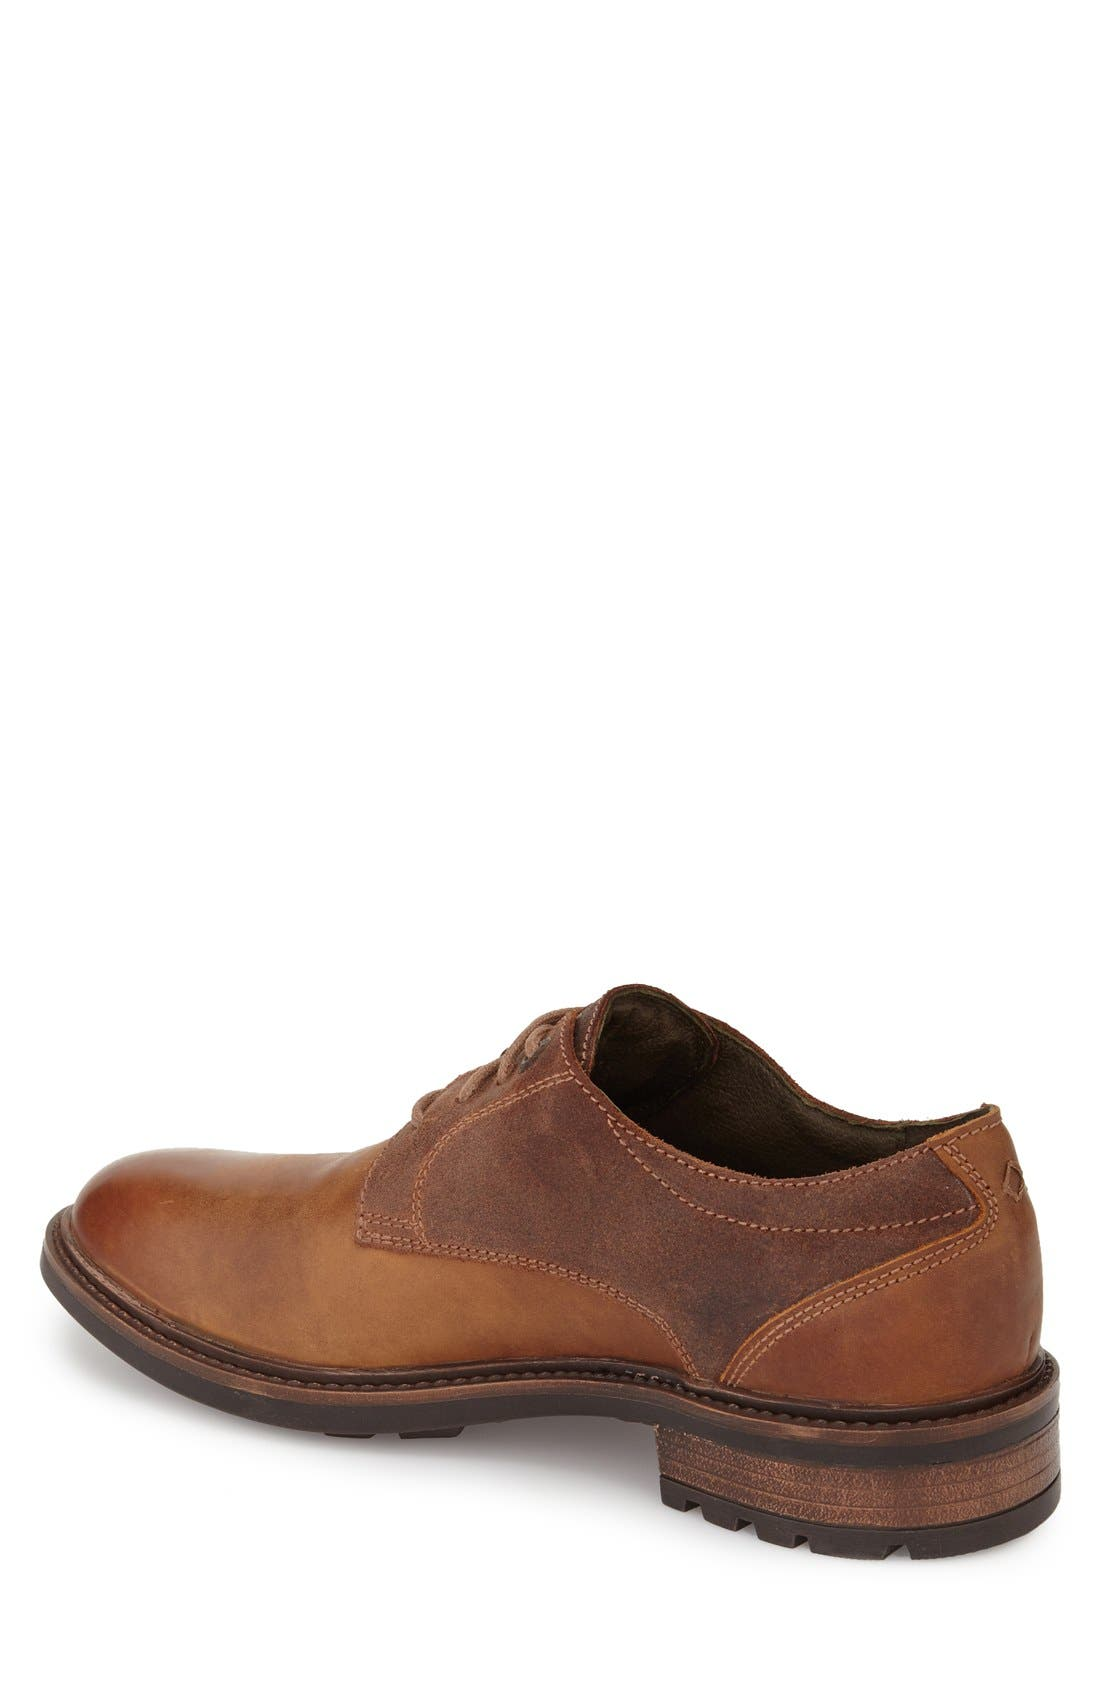 Josef Seibel Men's Oscar Plain Toe Derby 6RUIFLZx6r